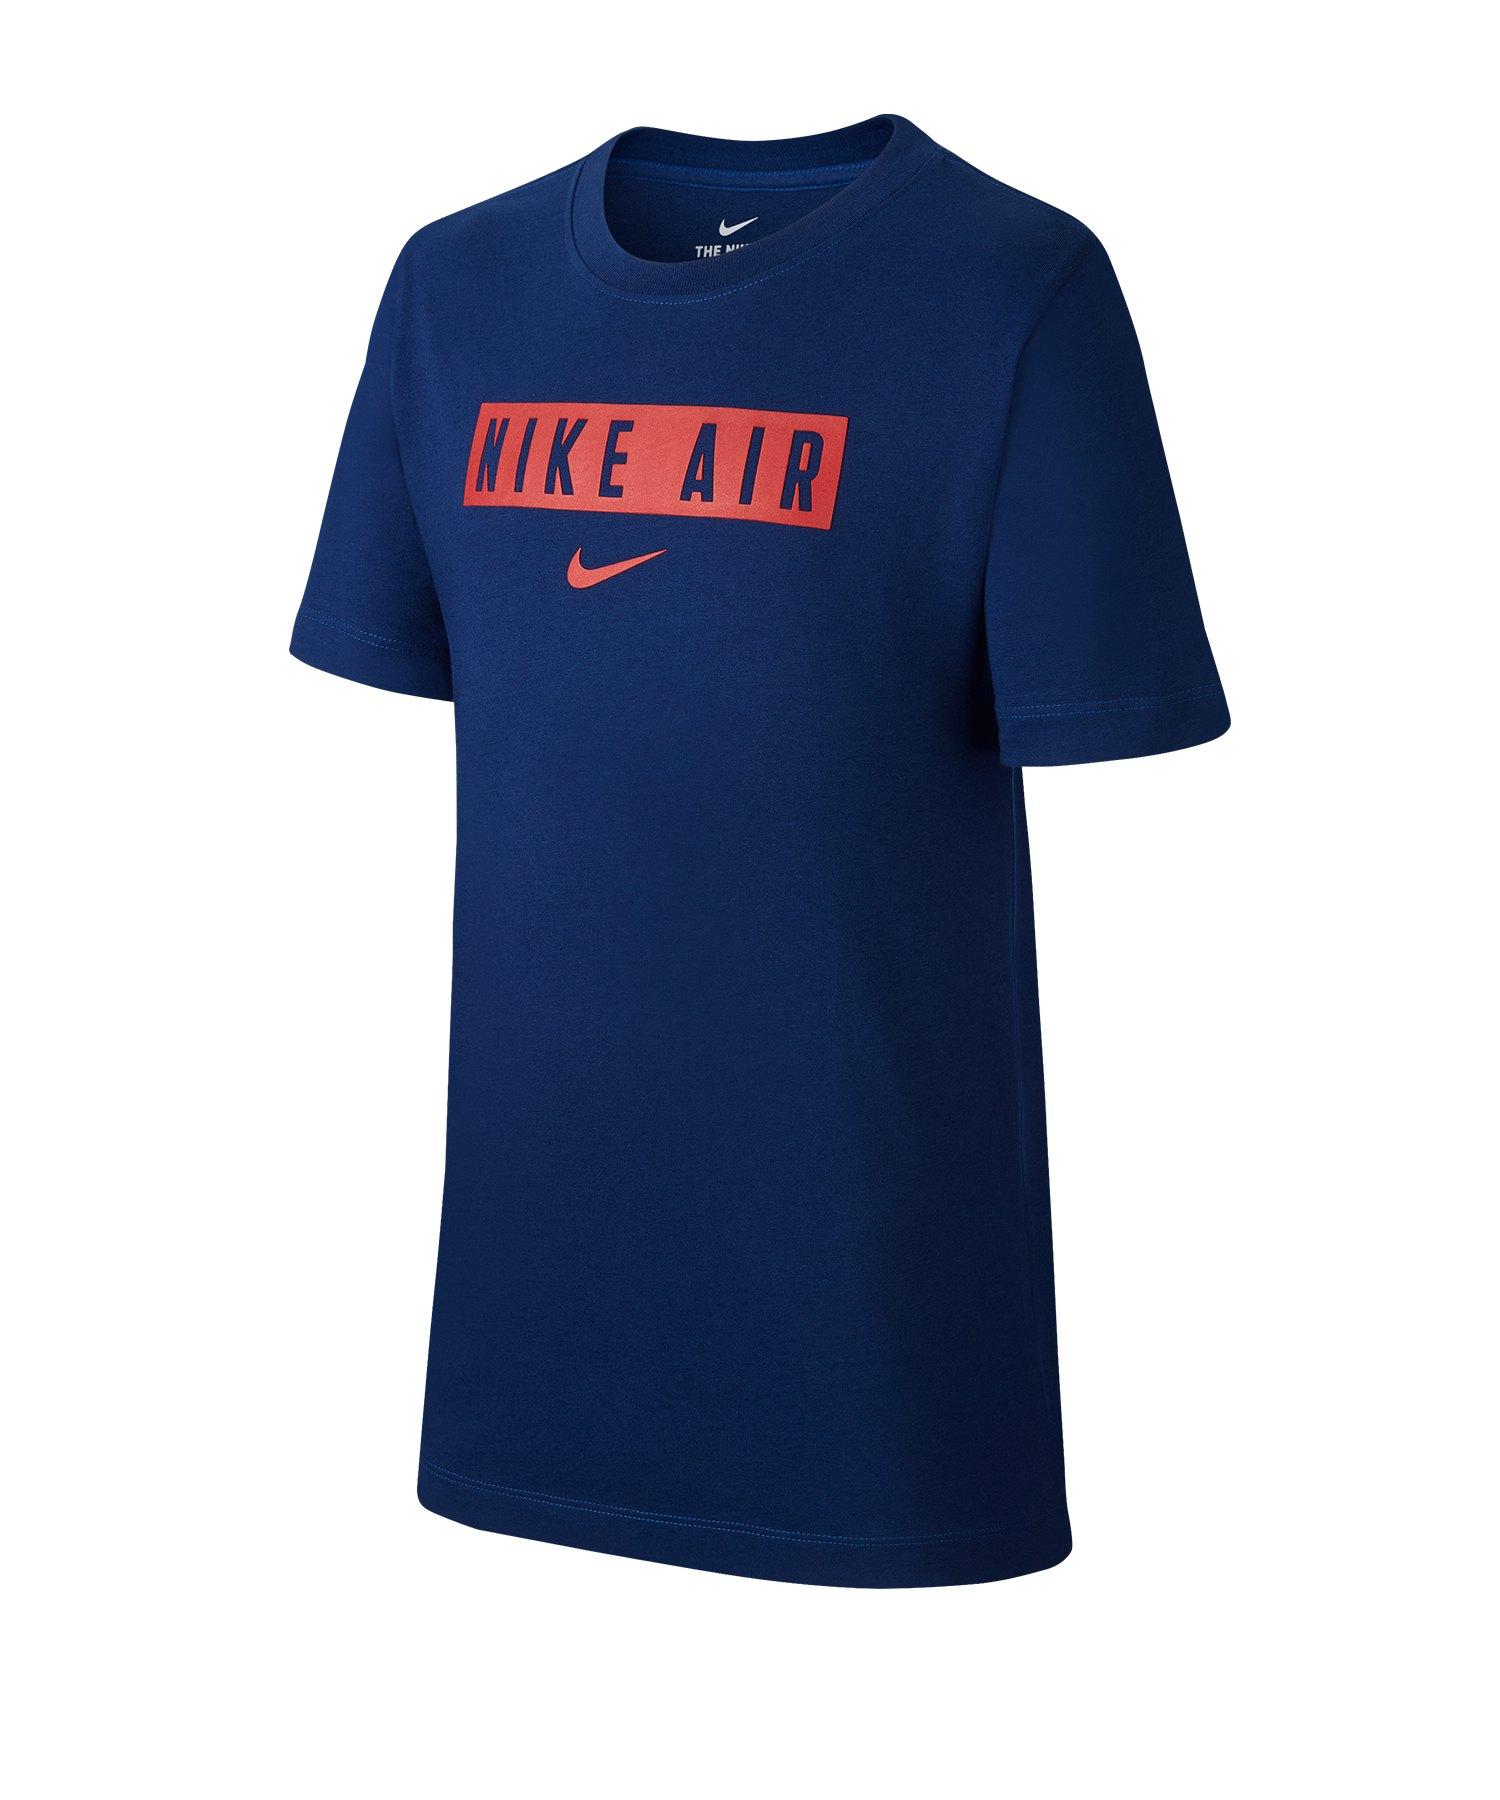 Nike Casual Tee T-Shirt kurzarm Kids Blau F492 - blau